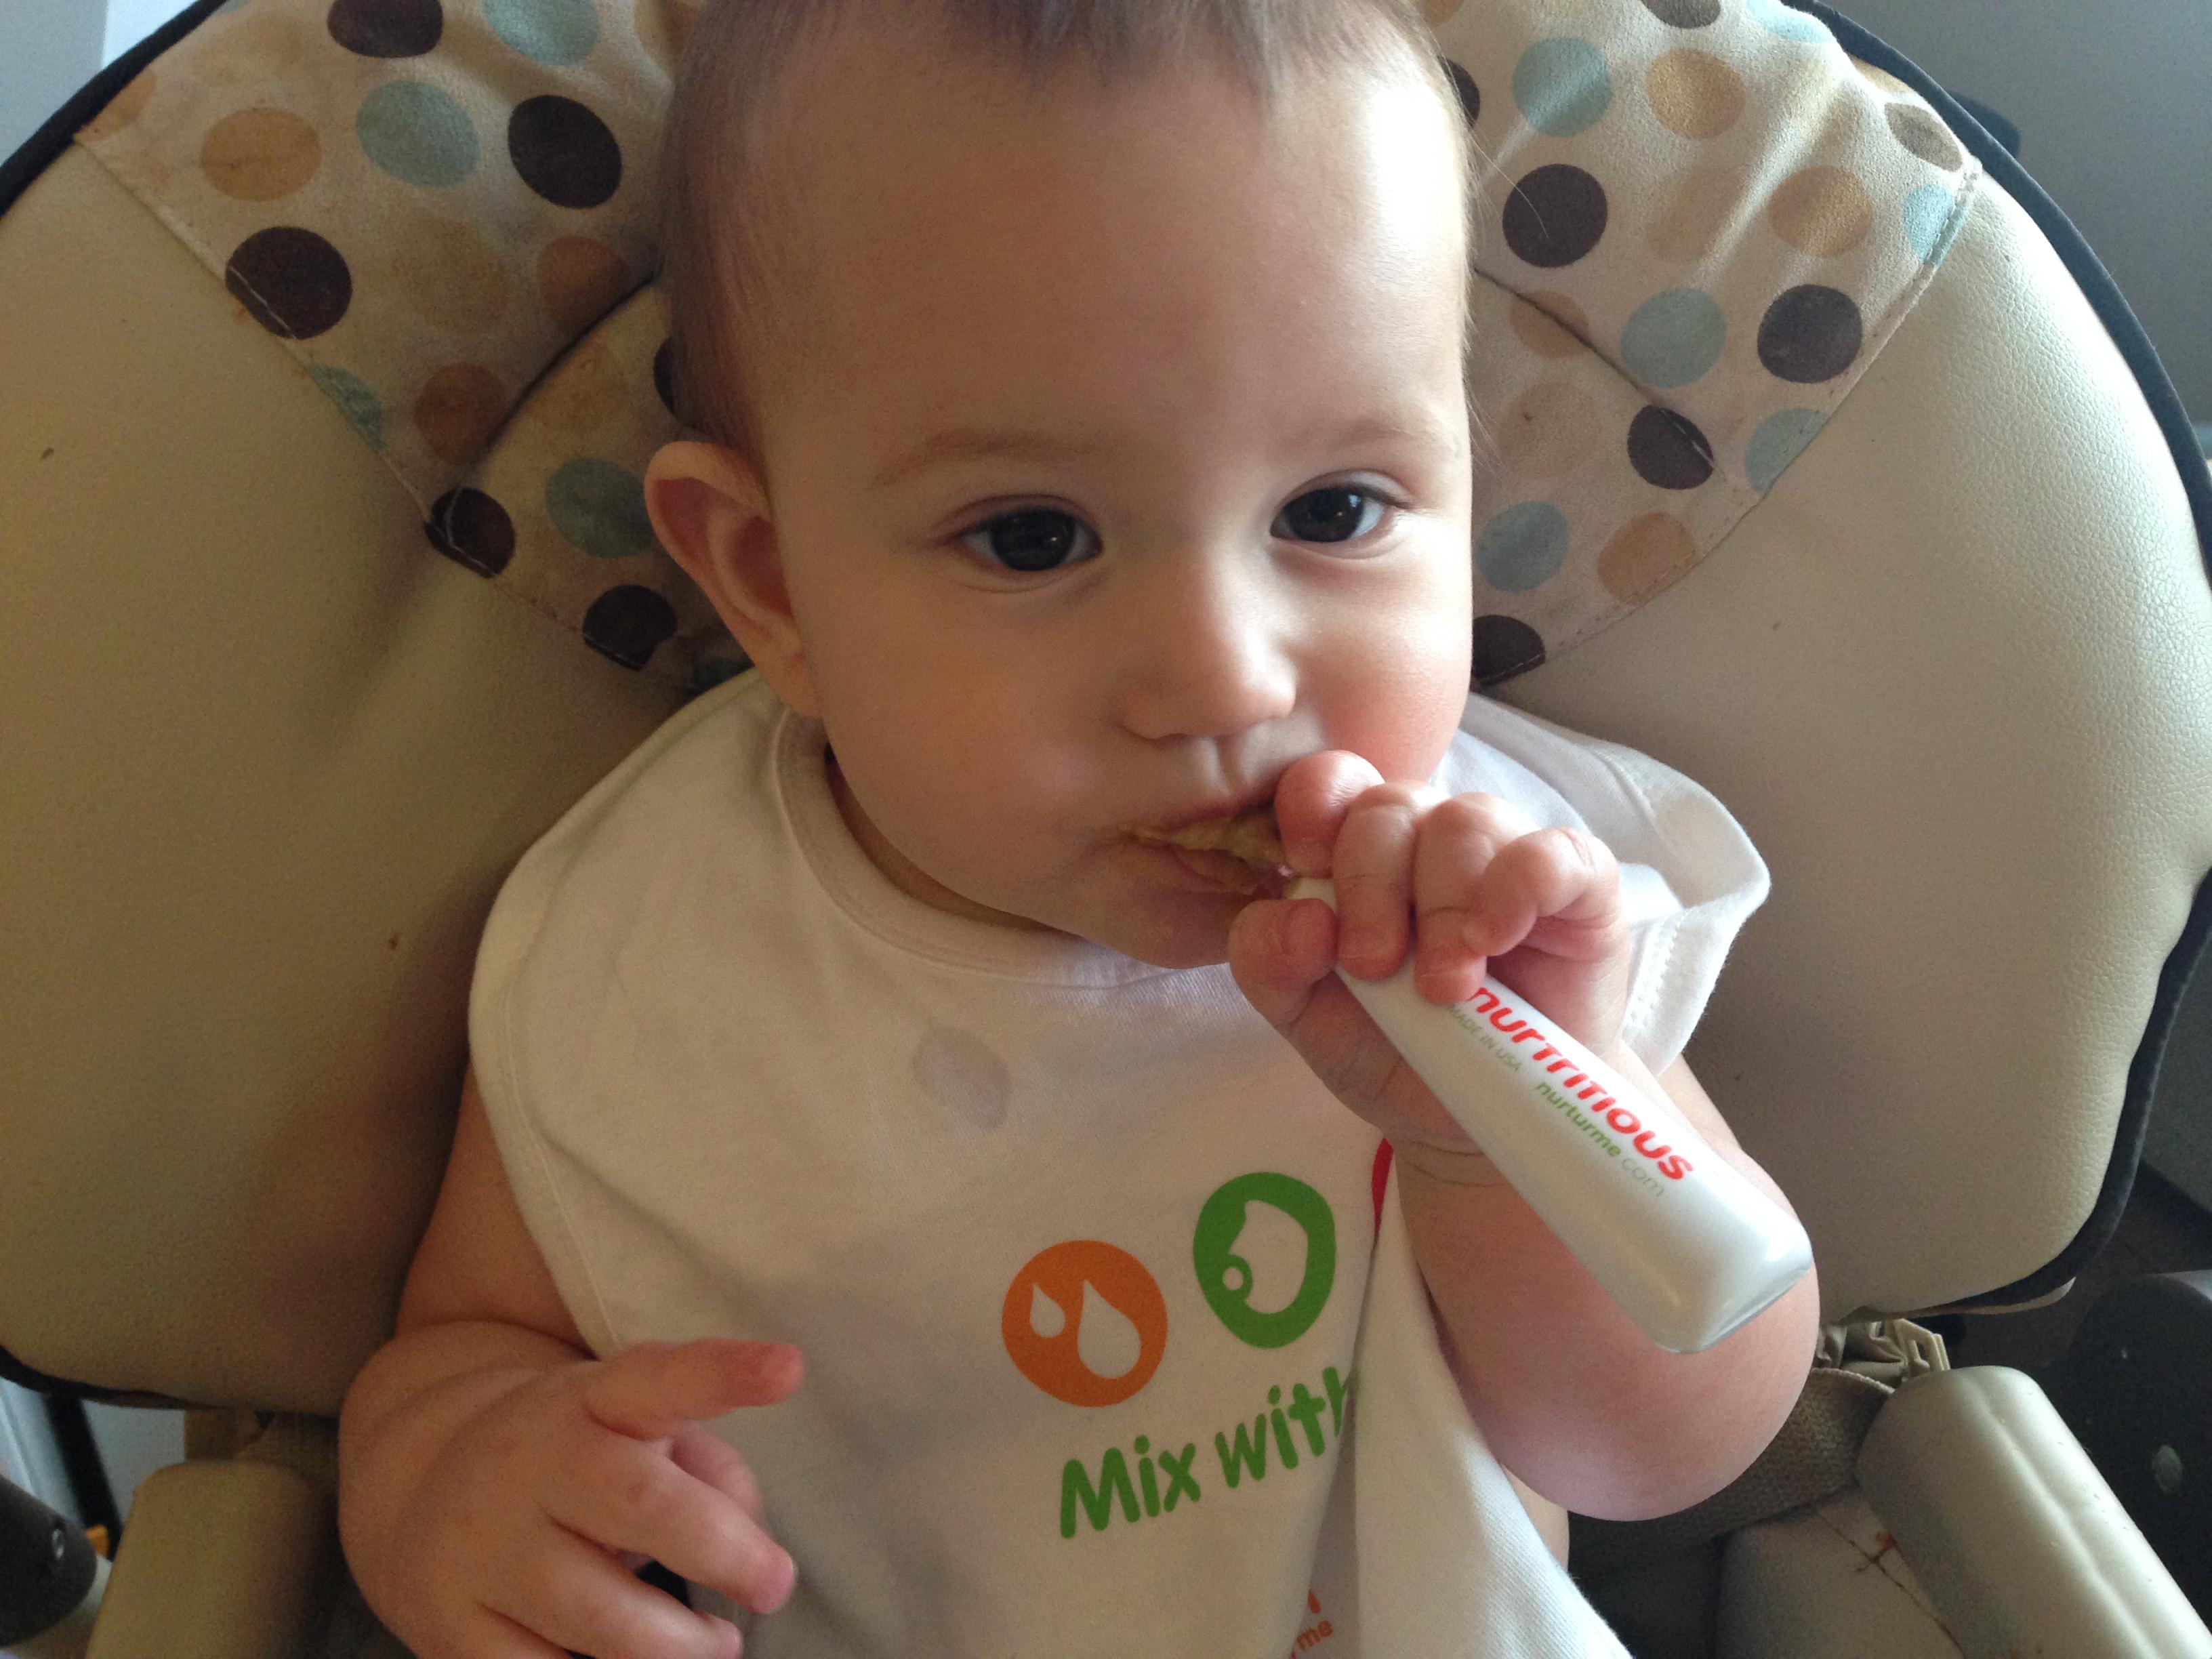 baby eating nurtutMe